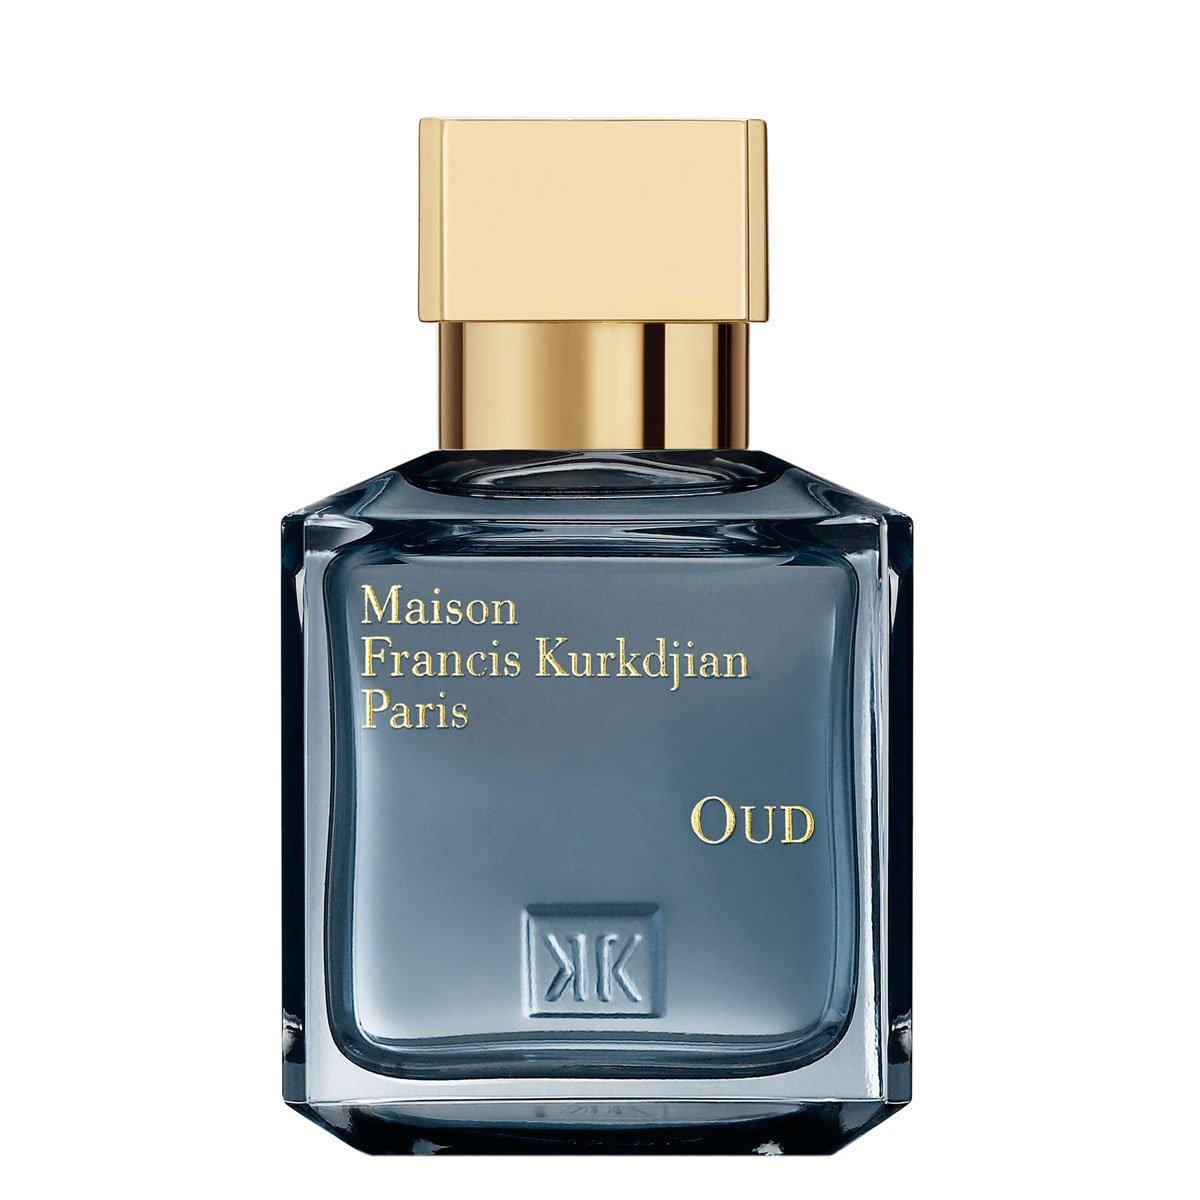 Maison Francis Kurkdjian Oud Eau De Parfum-2.4 oz.